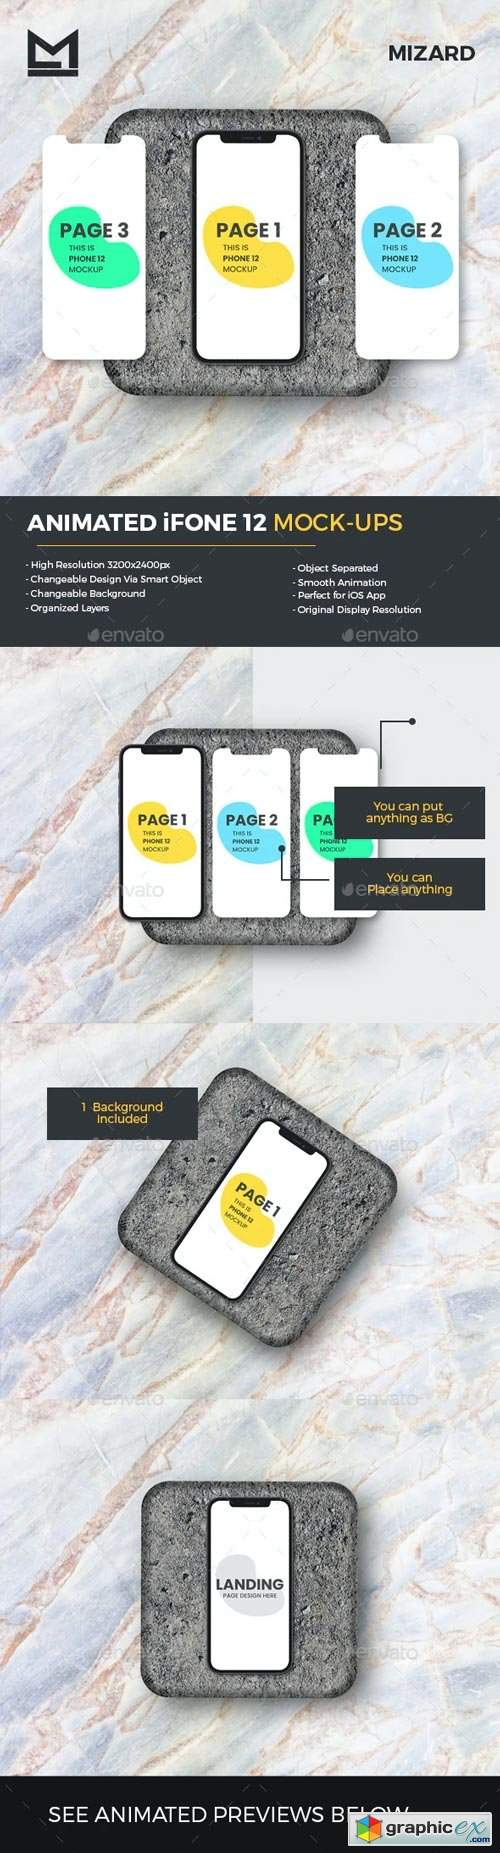 Animated iFone 12 App UI Presentation Mockup